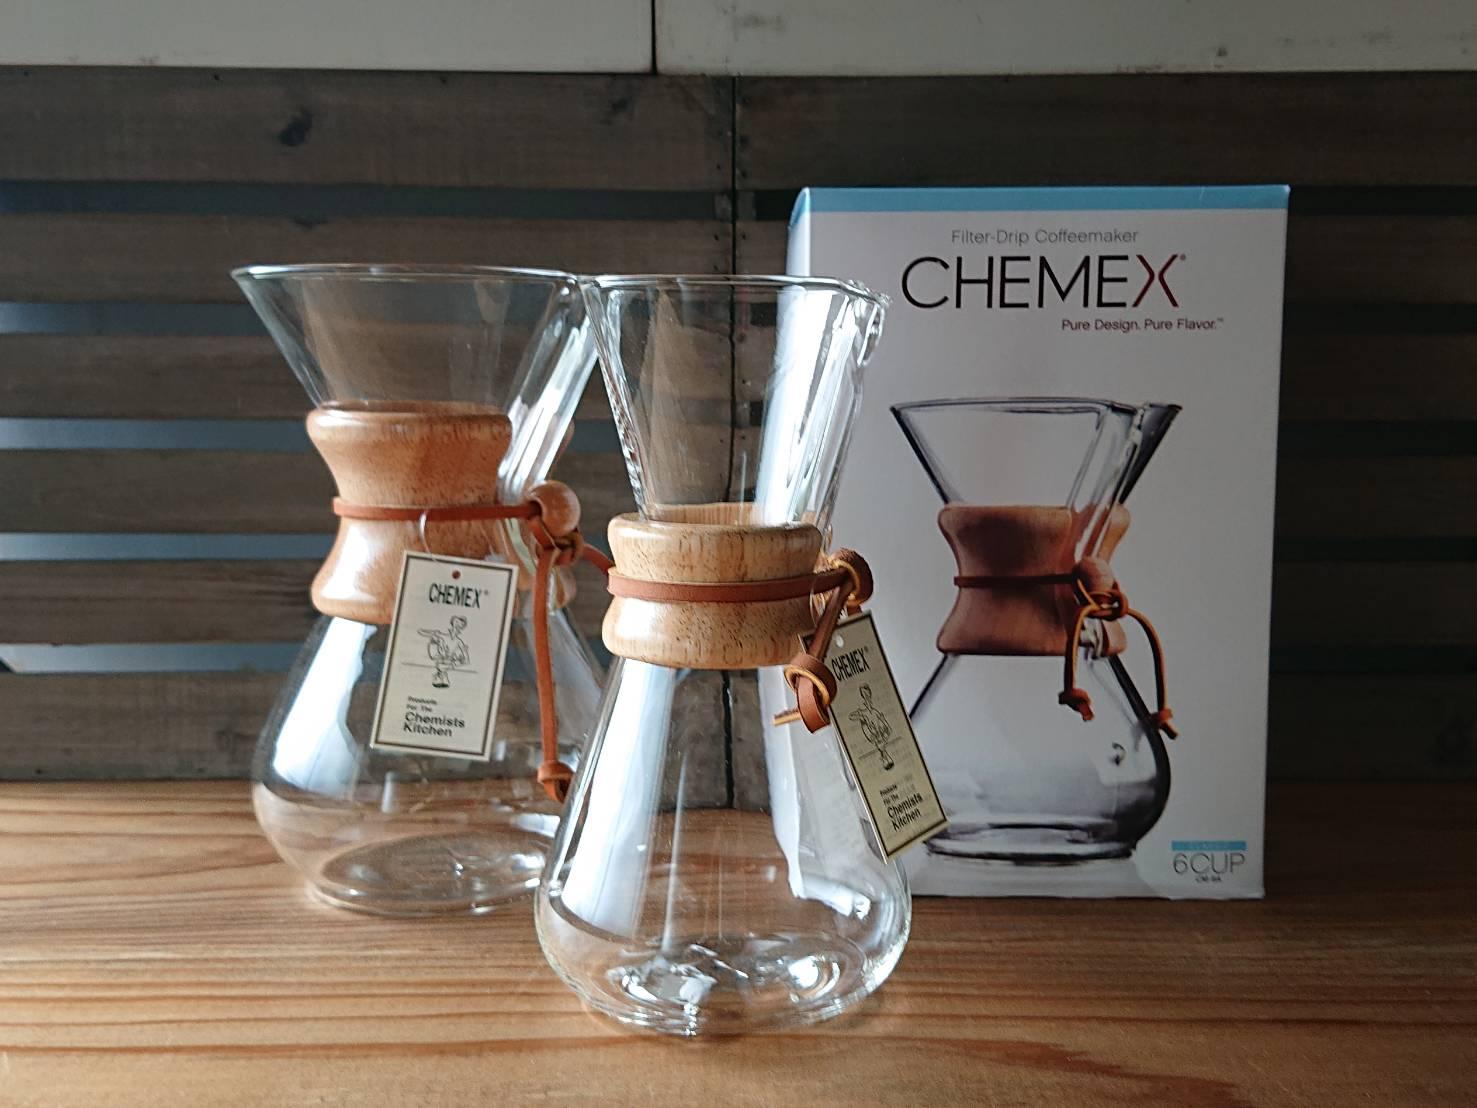 CHEMEX COFFEE MAKER 置いてあるだけで絵になるケメックス コーヒーメーカー